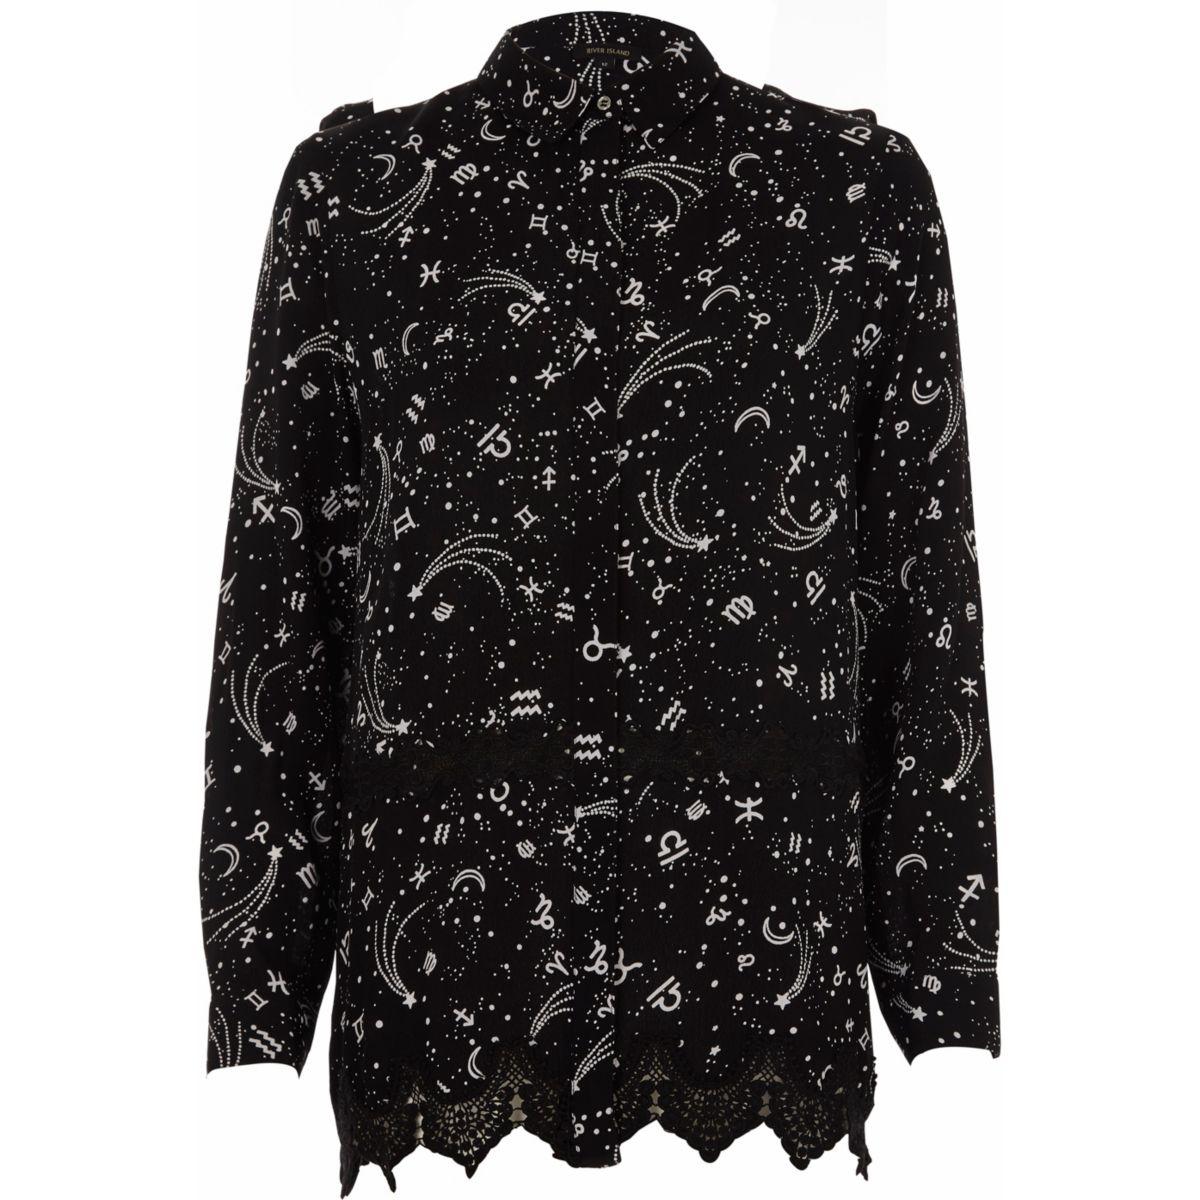 Black zodiac print lace insert shirt